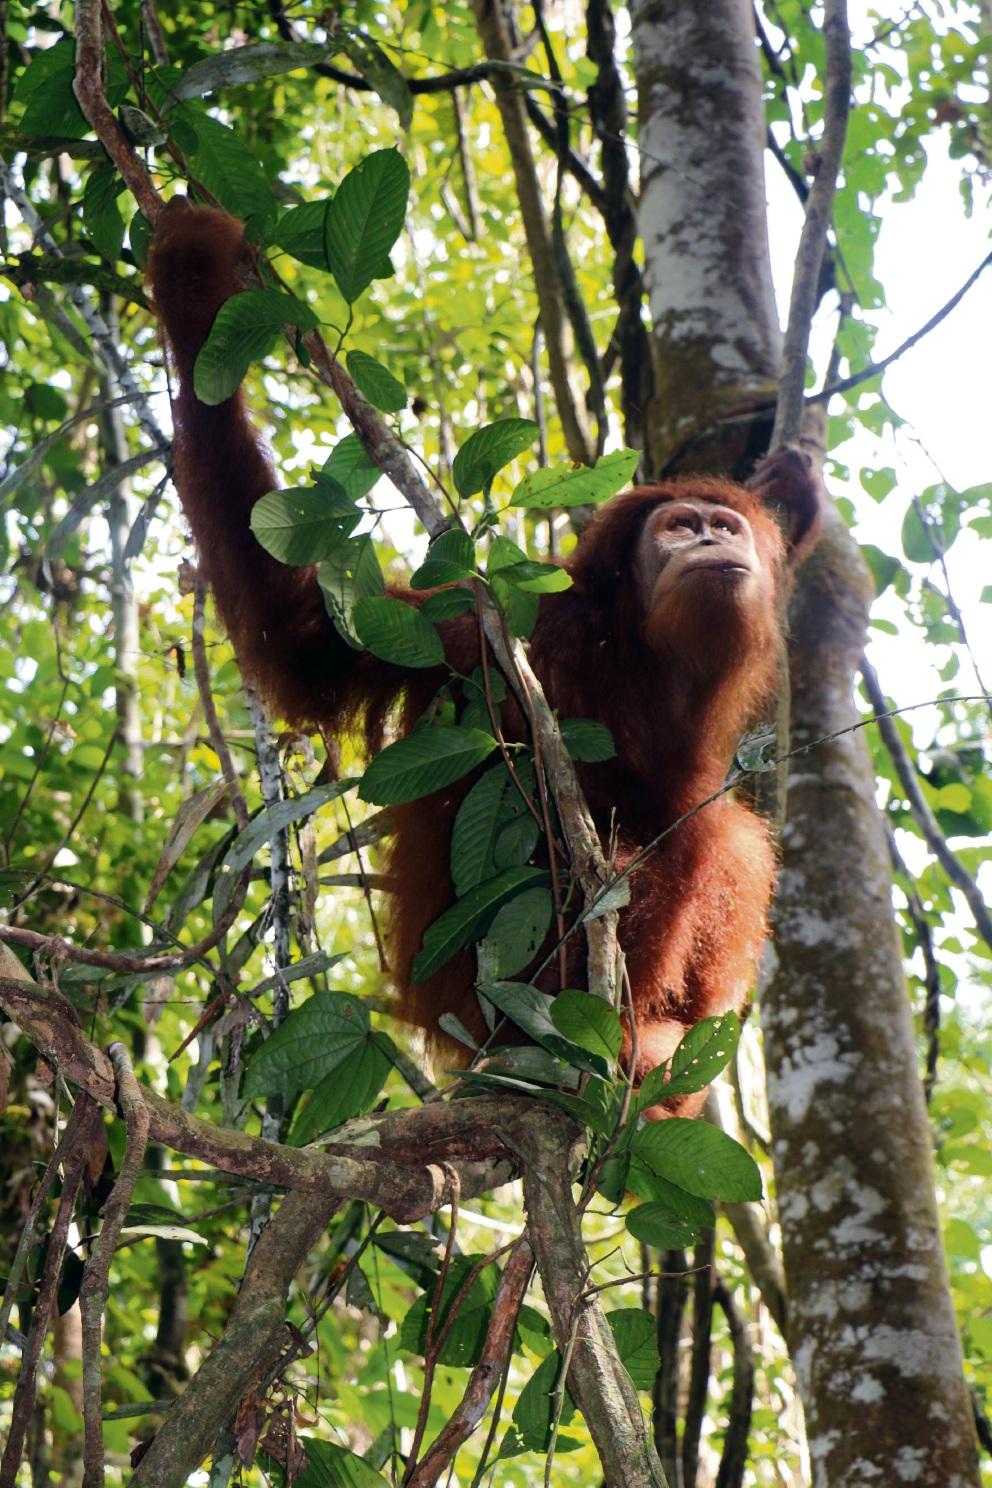 Perth Zoo releases orang-utan Nyaru into Sumatran rainforest